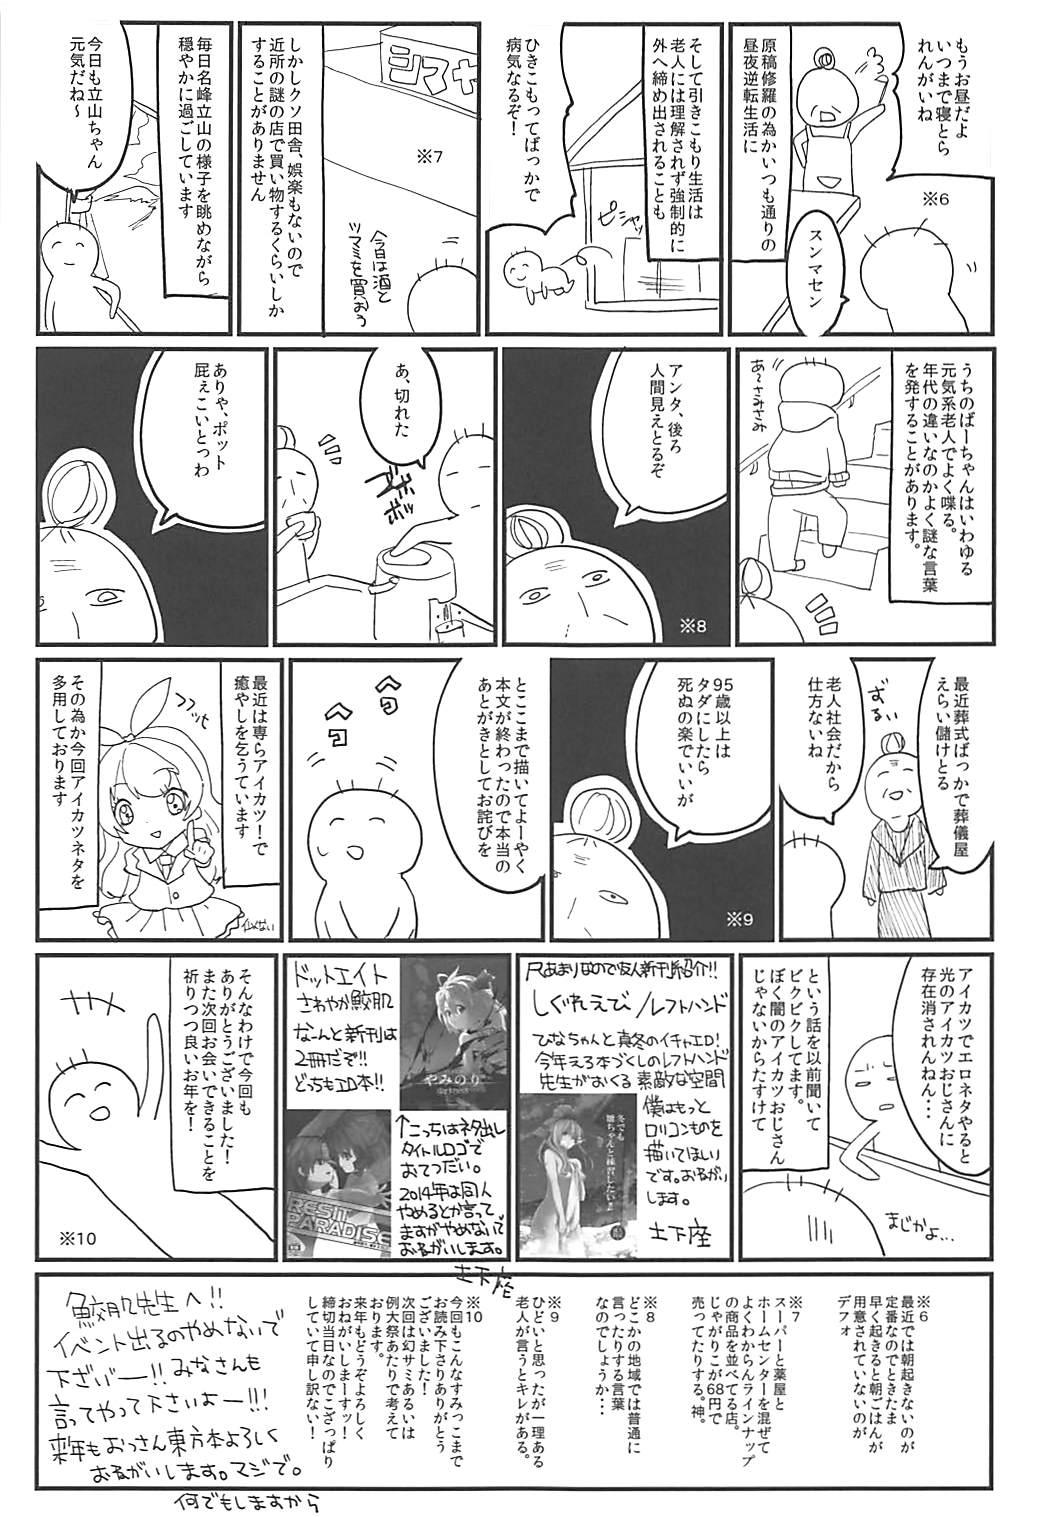 Shinkou Material Sai 31